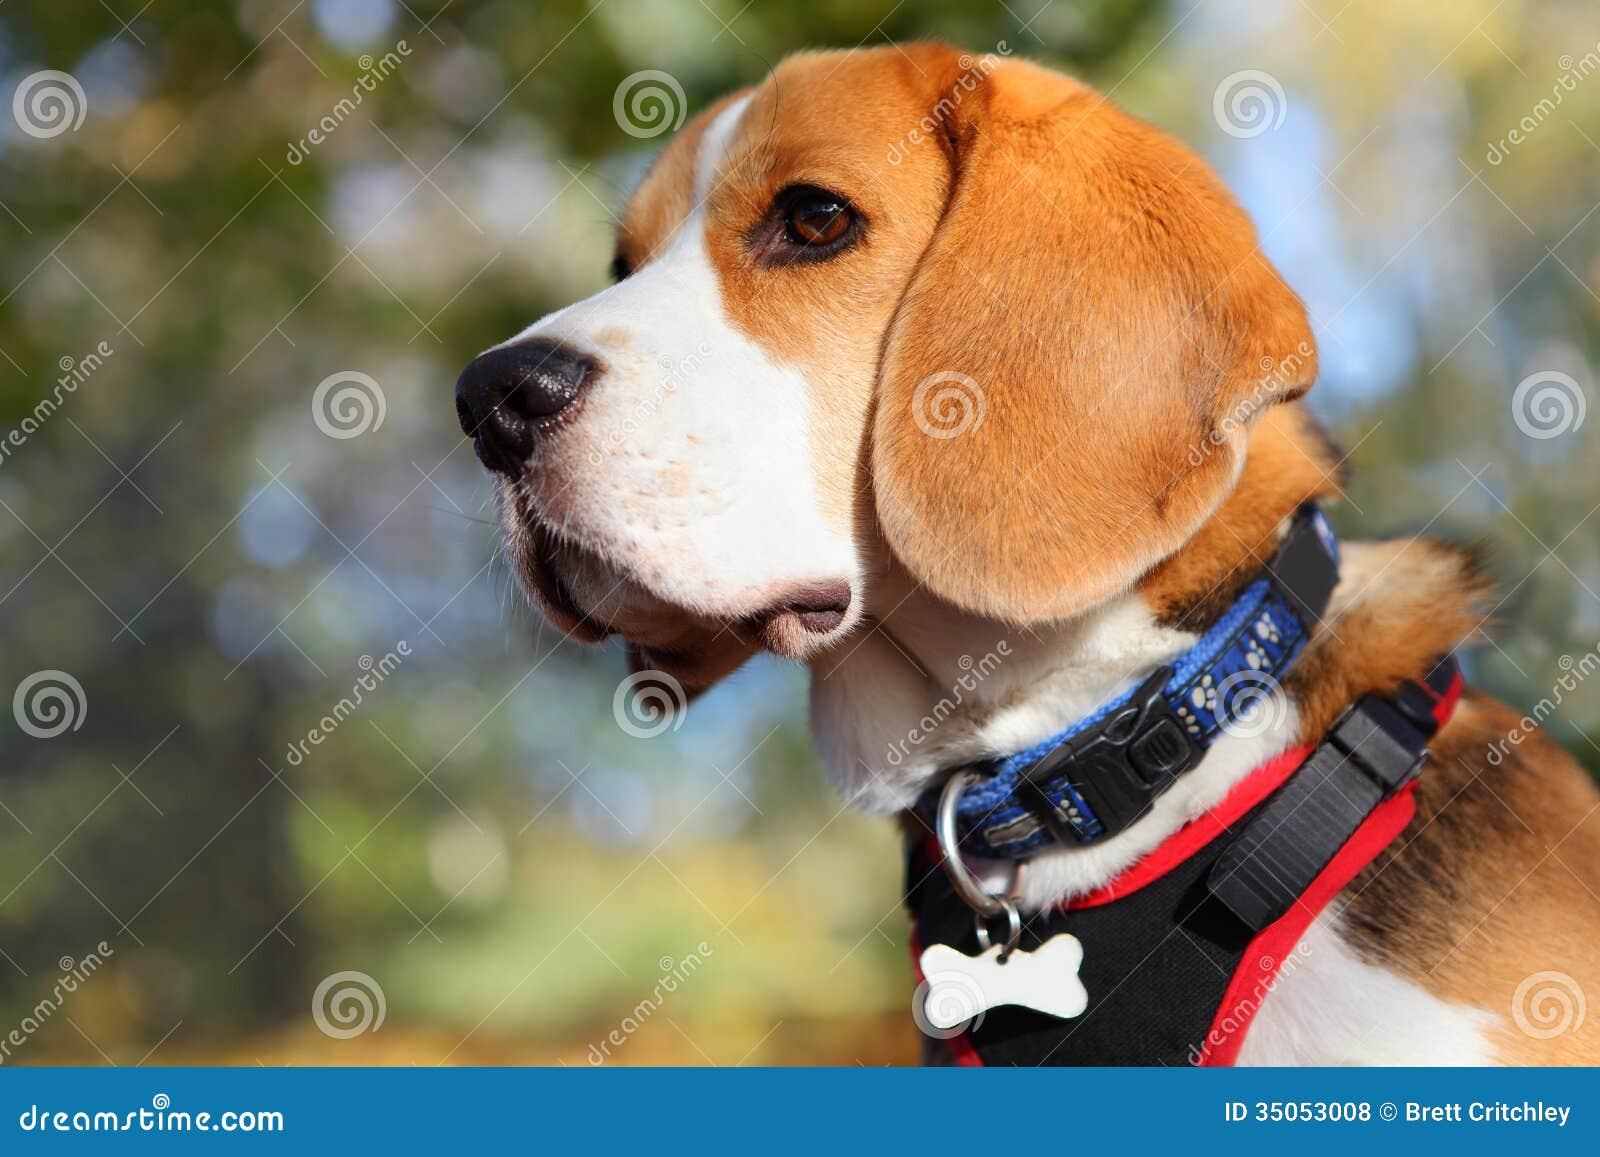 Beagle dog portrait stock photo. Image of beagle, head - 35053008